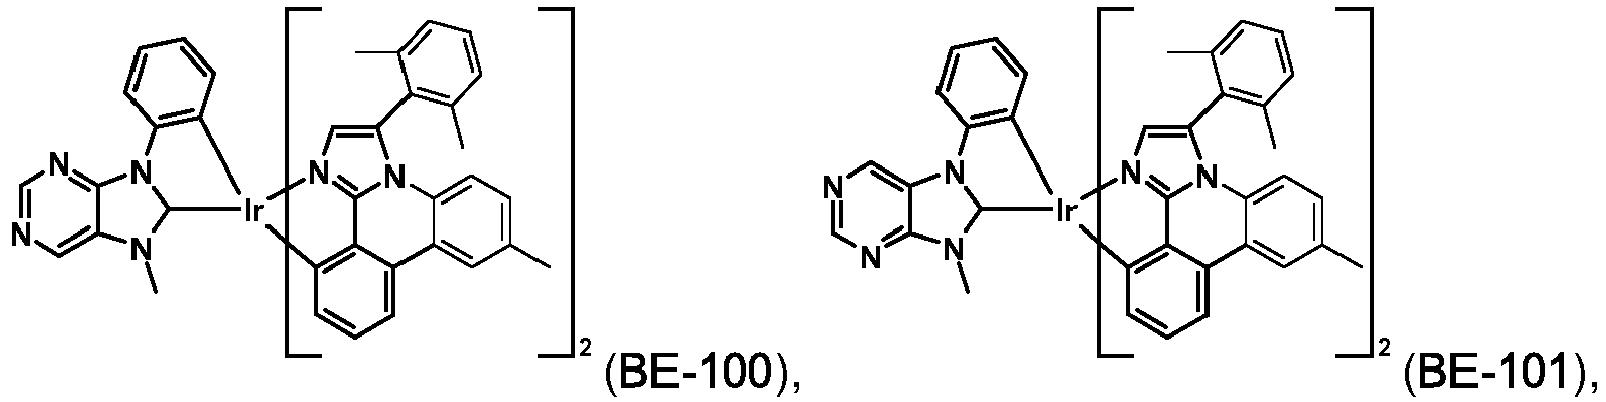 Figure imgb0797